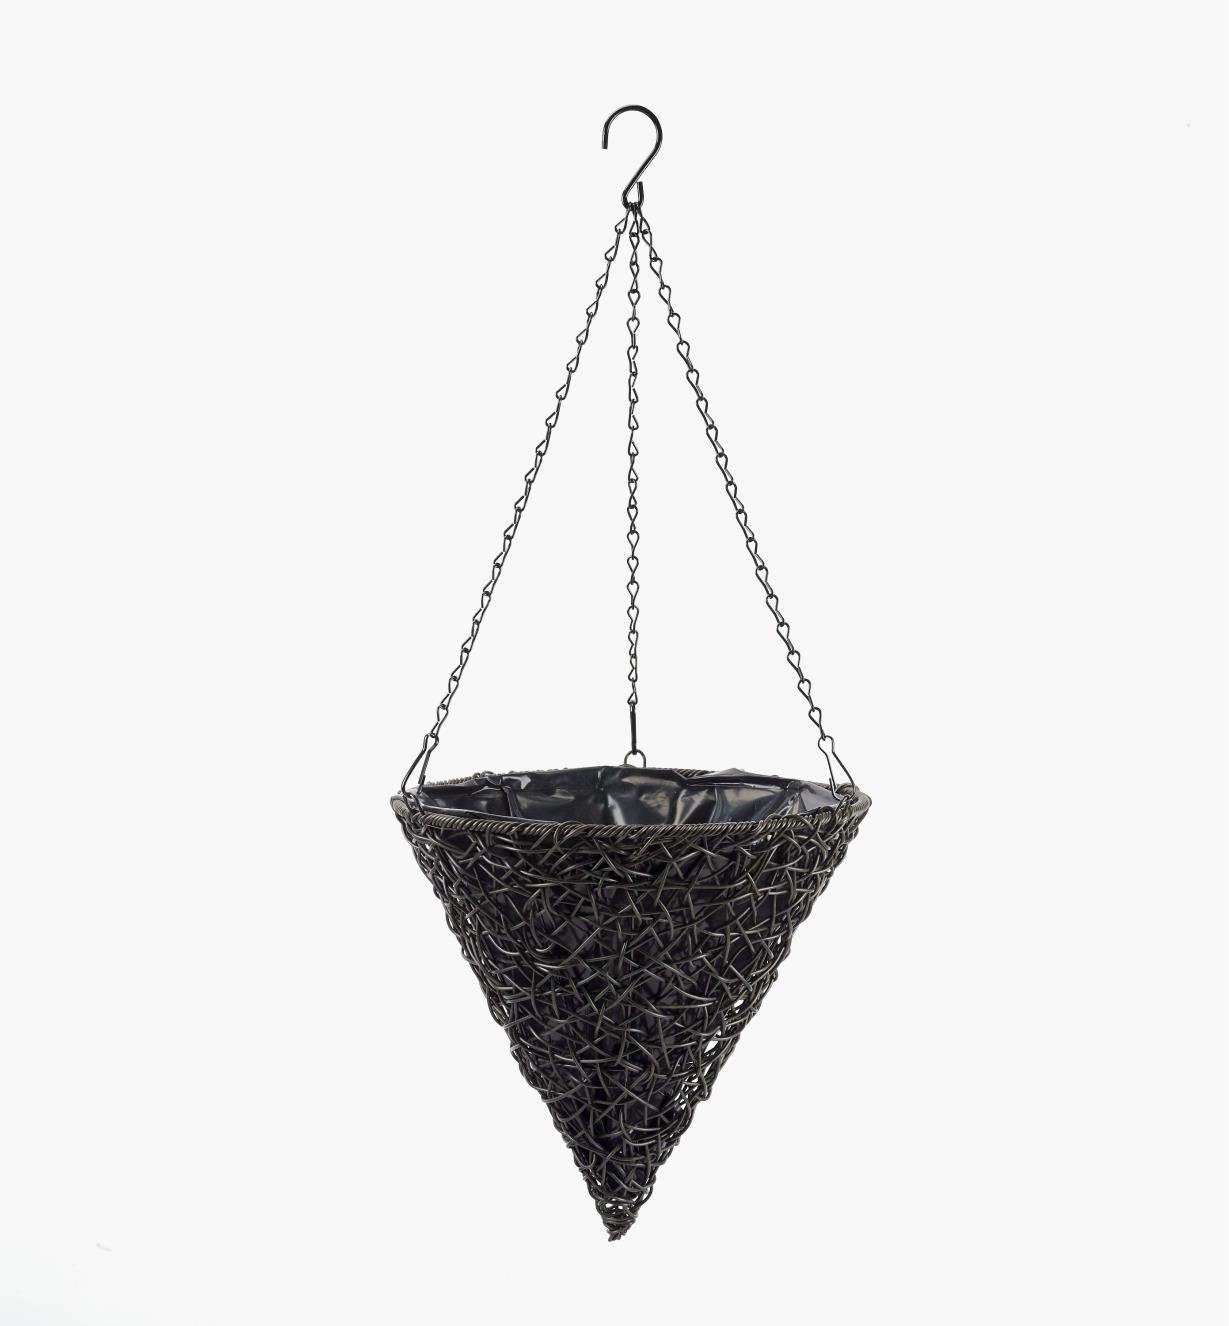 XB692 - Hanging Cone-Shaped Basket